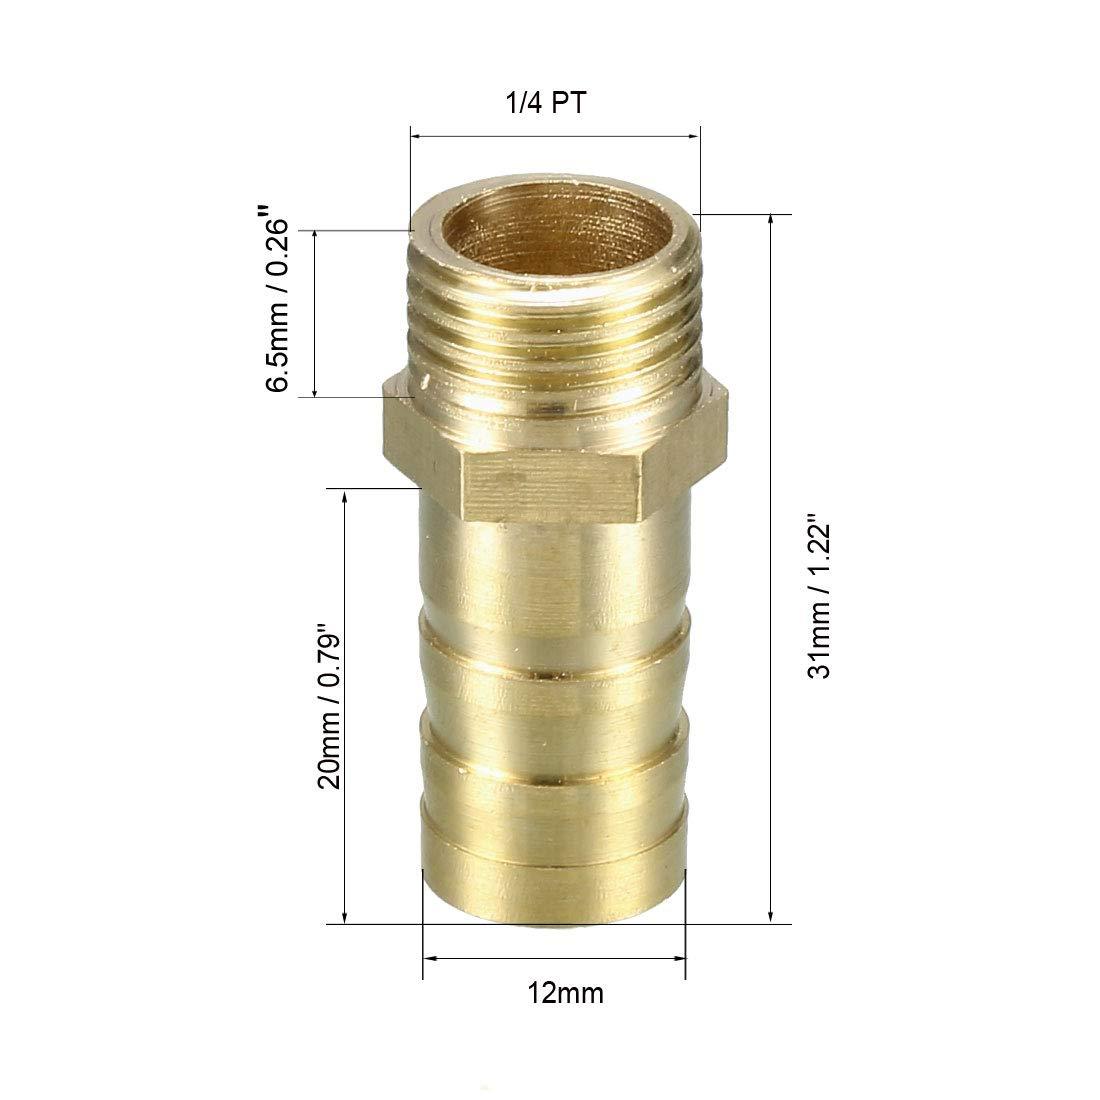 sourcing map Adaptateur laiton raccord tuyau barbel/é 8mm Barbelure x 1//8 PT M/âle Tuyau 5Pcs